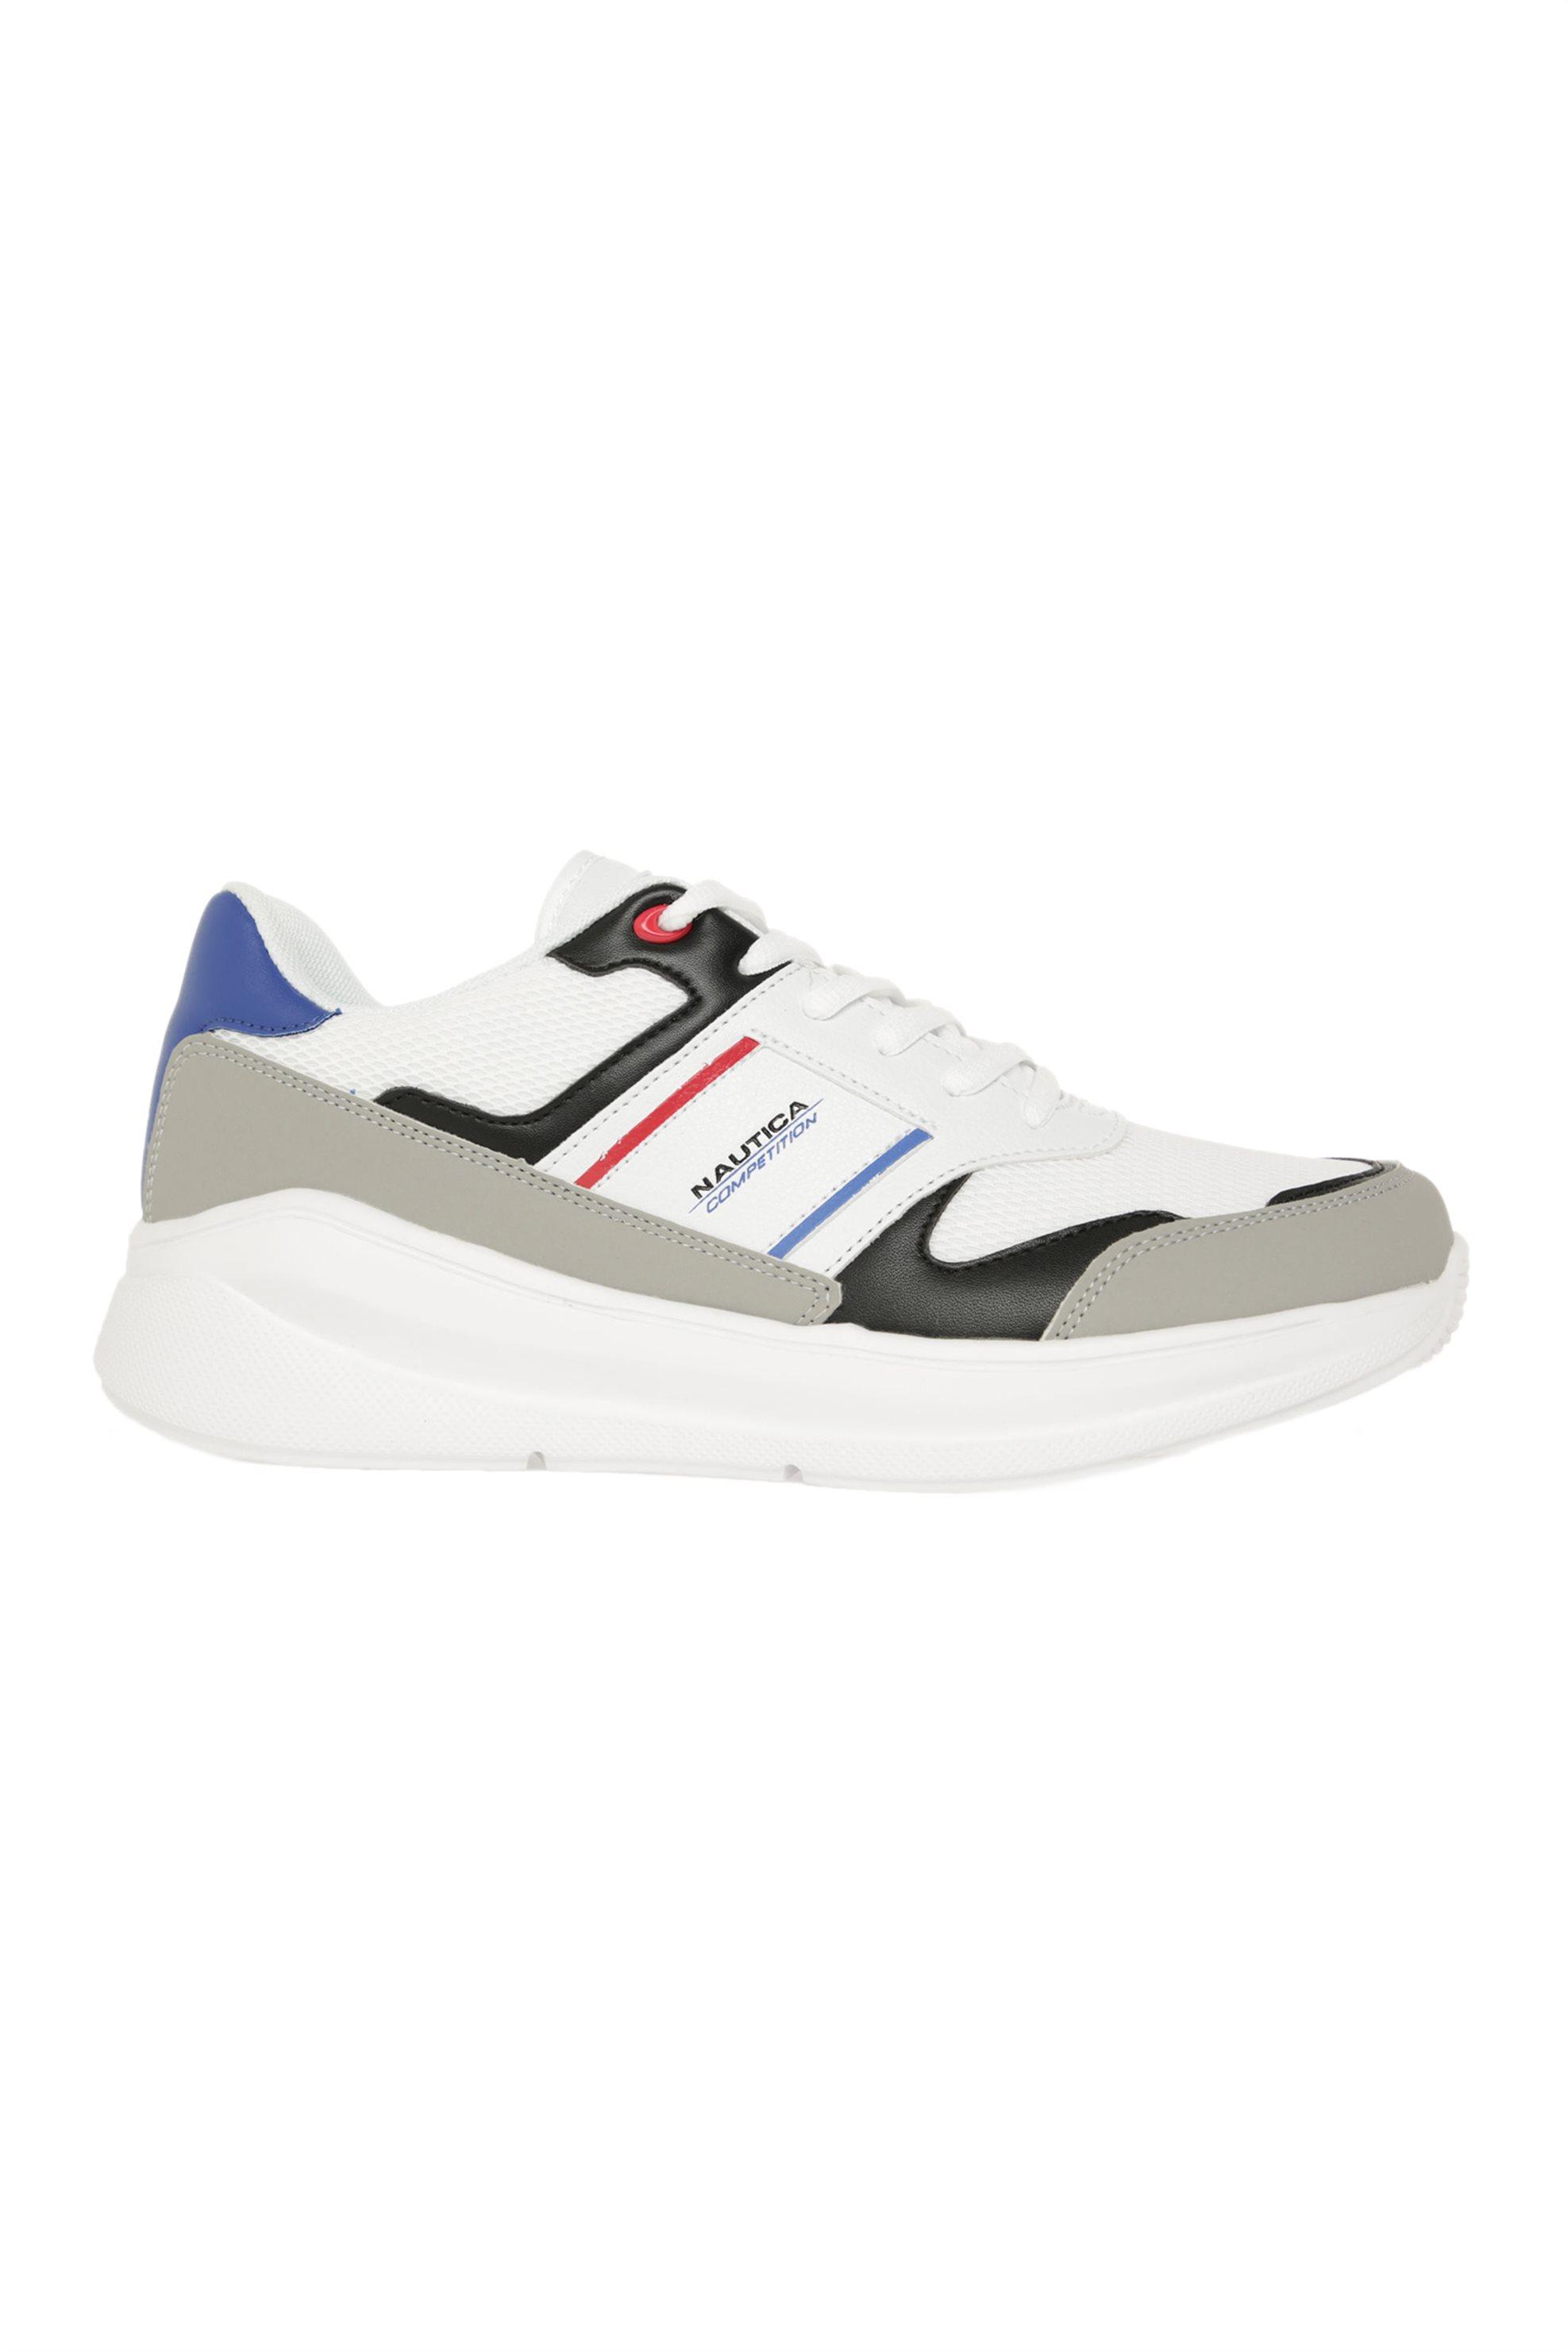 "Nautica ανδρικά sneakers ""Murillo"" – EL1954 – Λευκό"